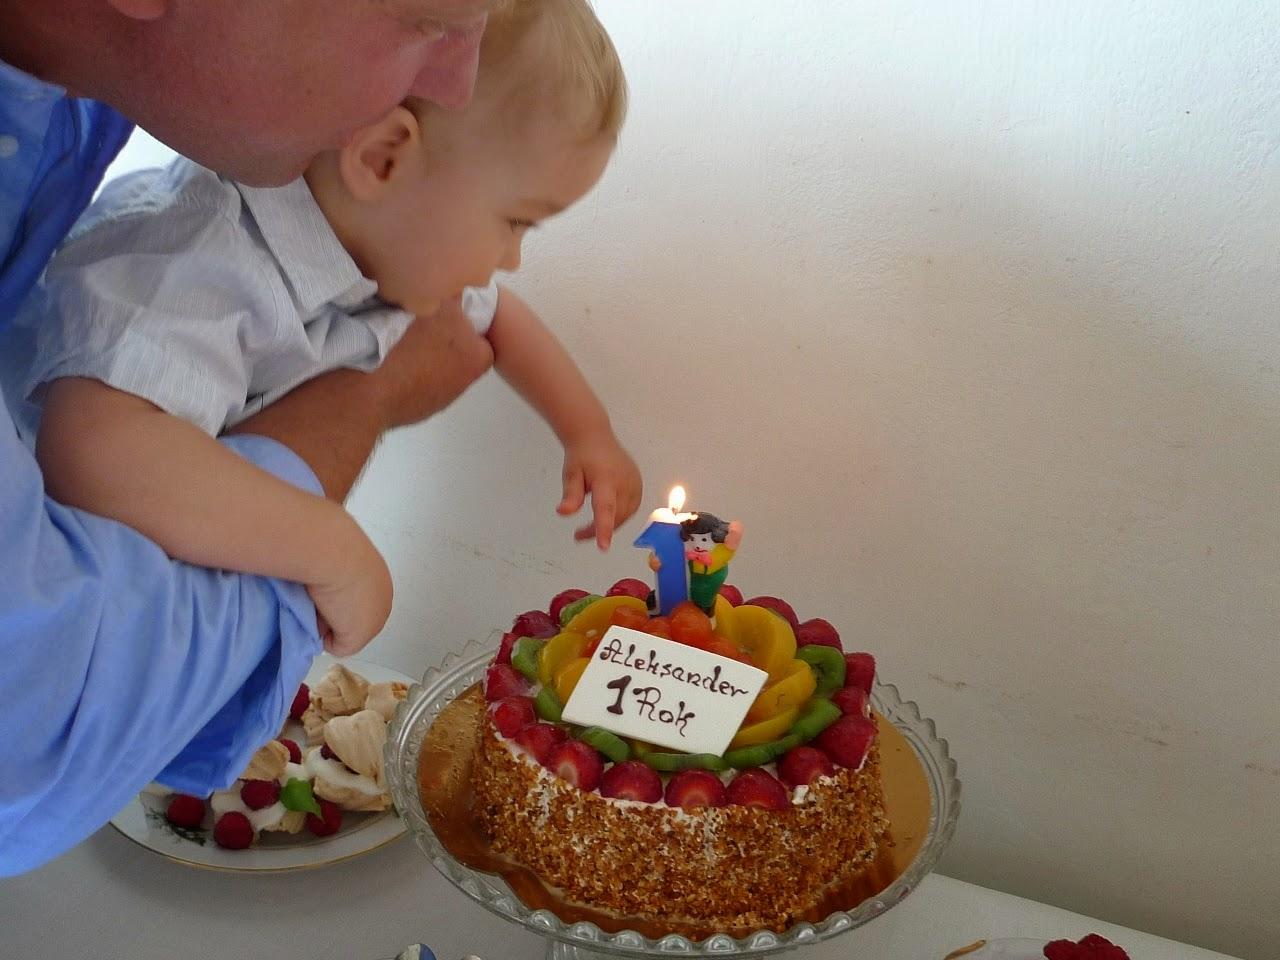 Mam już roczek!/I am one year old!